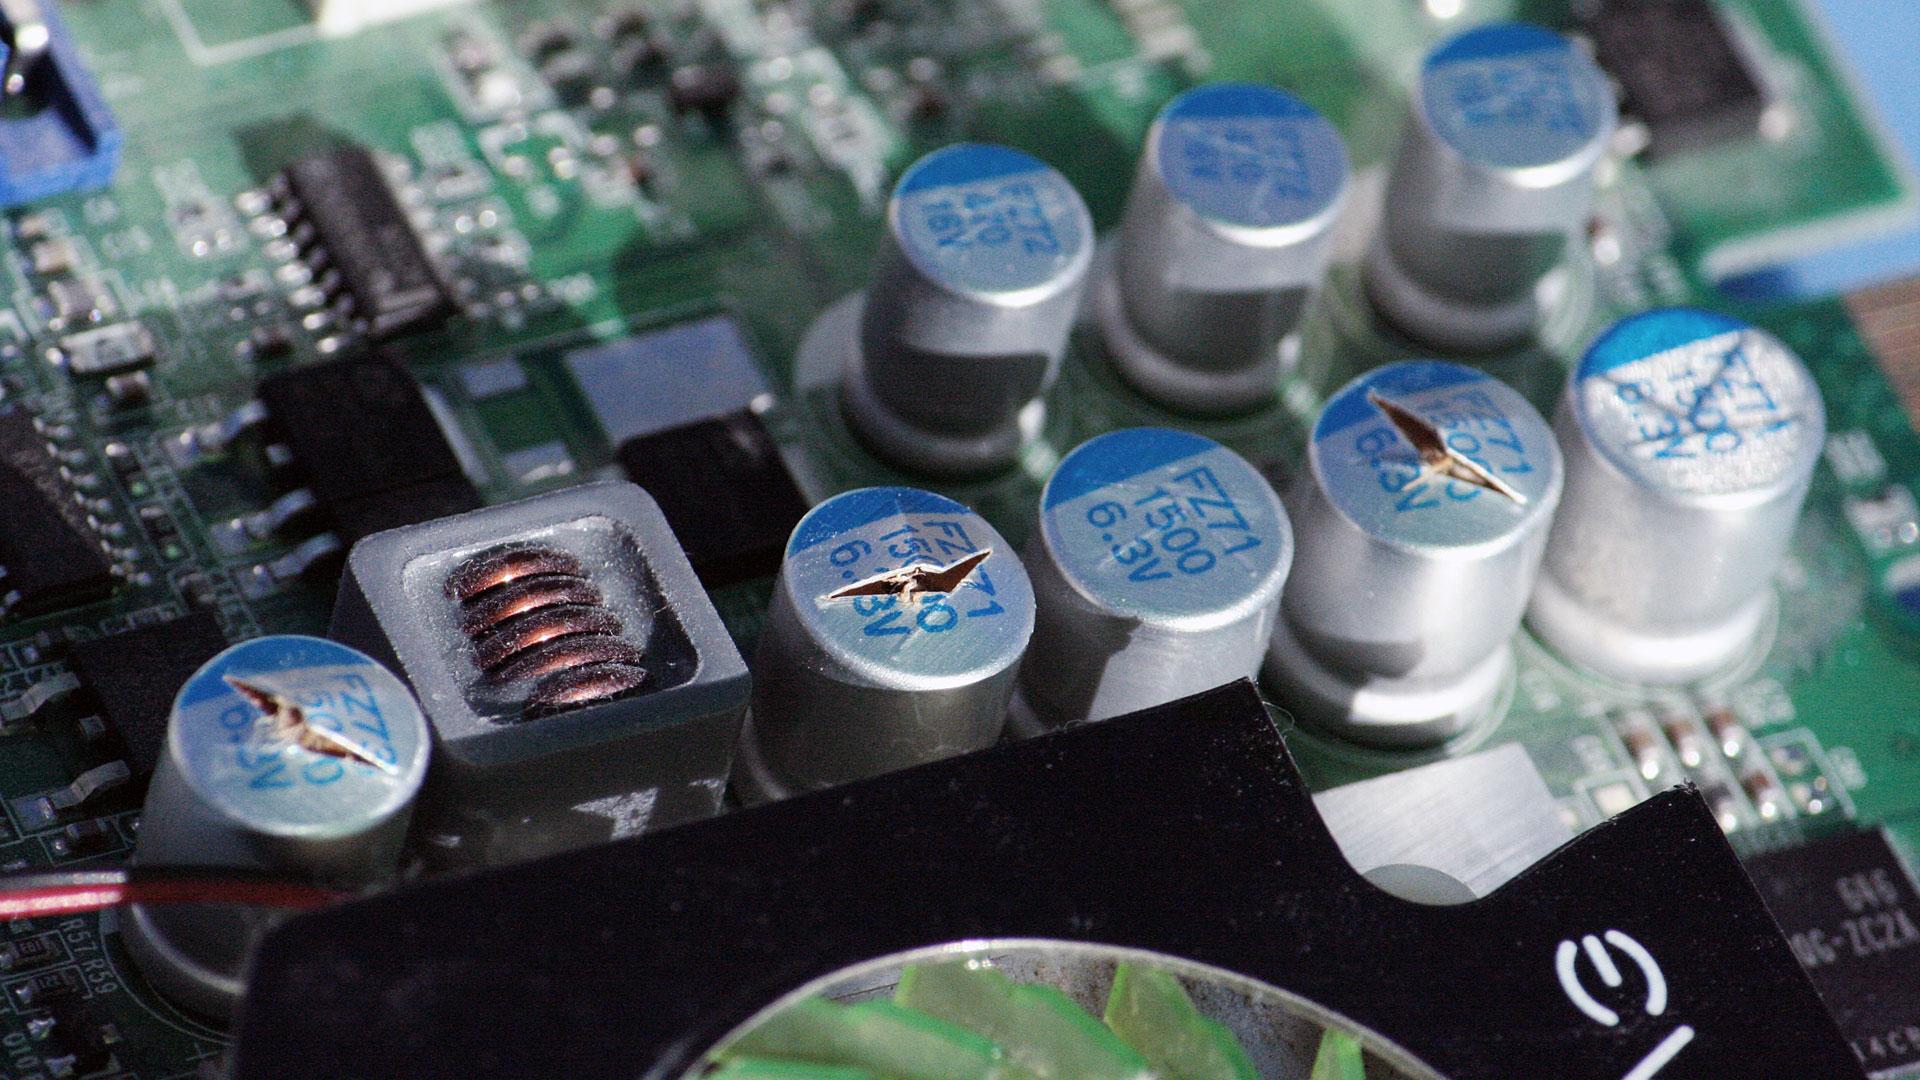 evga_nvidia_blown_capacitors_1080.jpg